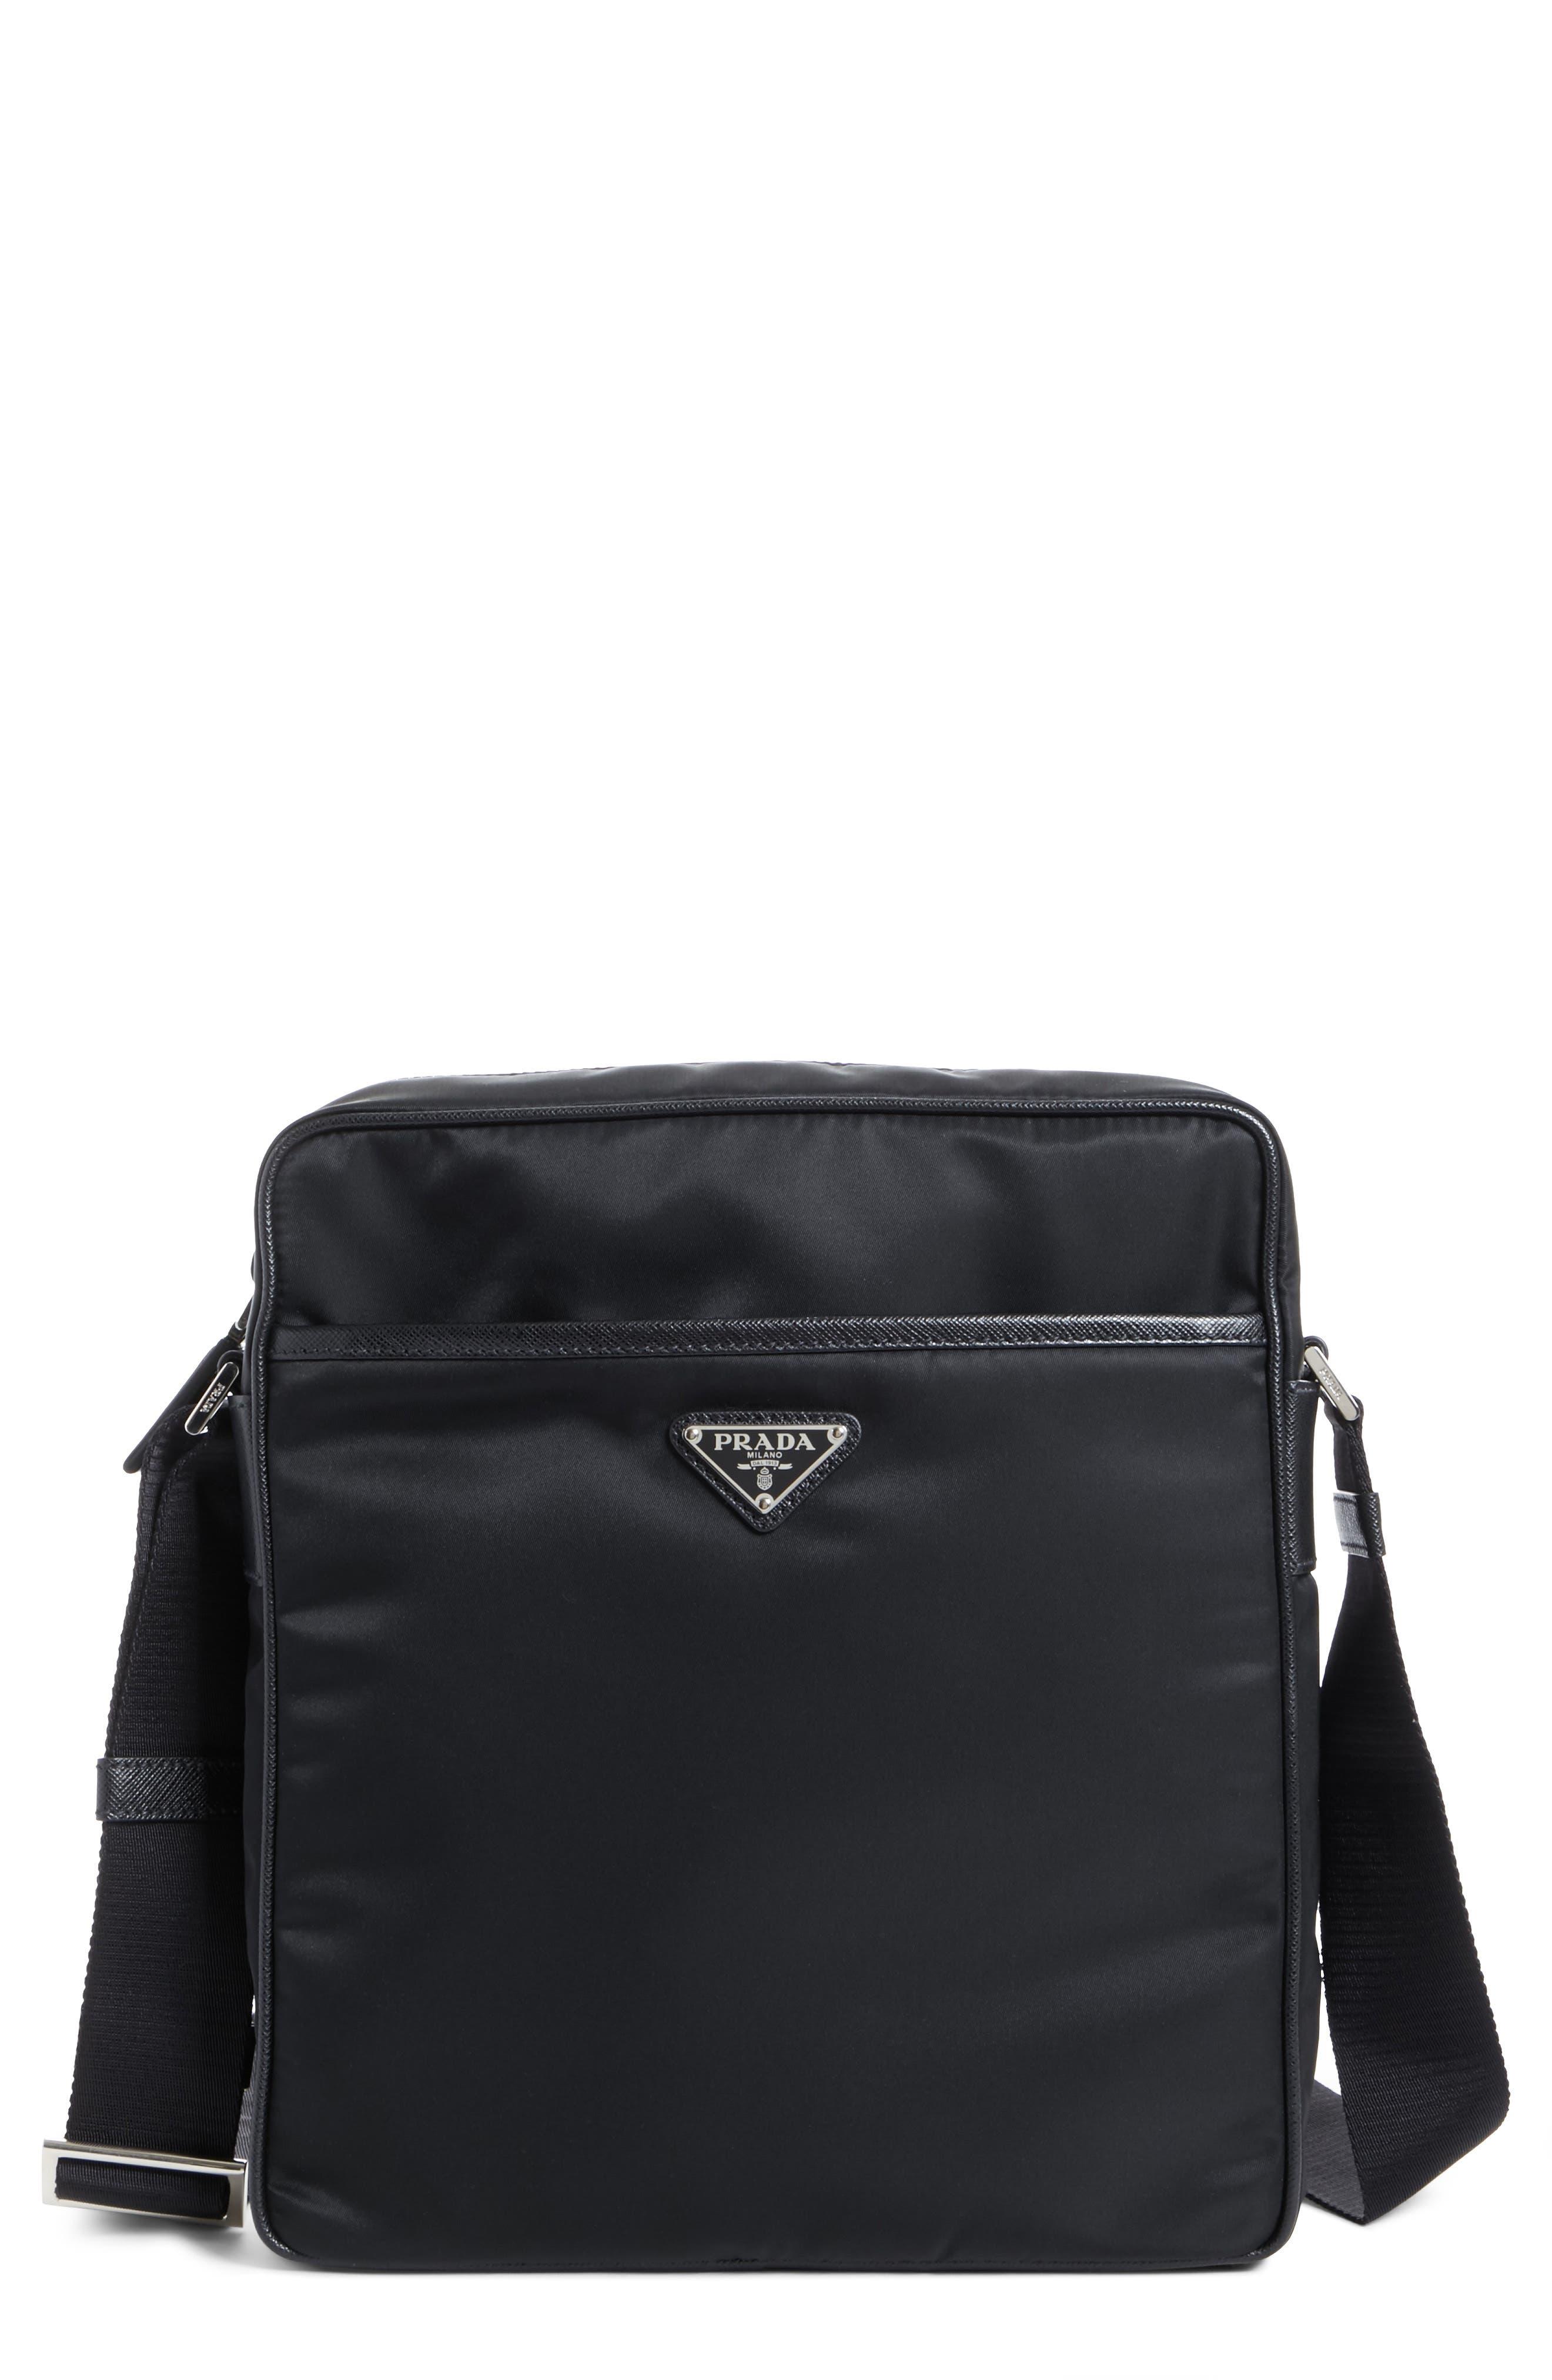 Saffiano Leather Crossbody Bag,                         Main,                         color, 001